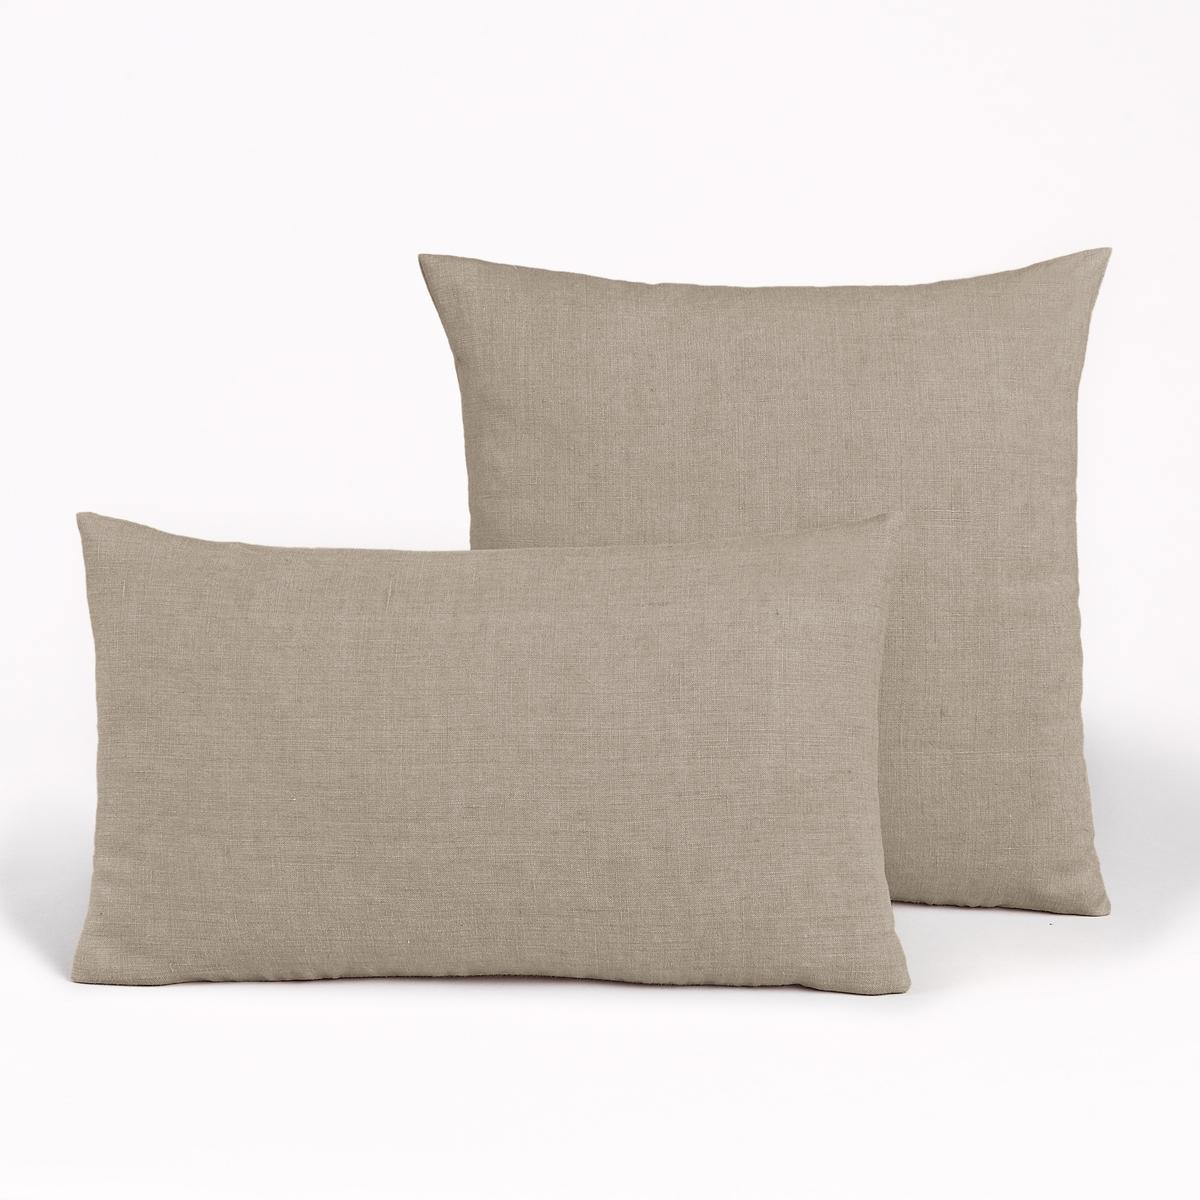 Льняной La Redoute Чехол для подушки Georgette 50 x 30 см бежевый льняной la redoute чехол для подушки georgette 50 x 30 см желтый